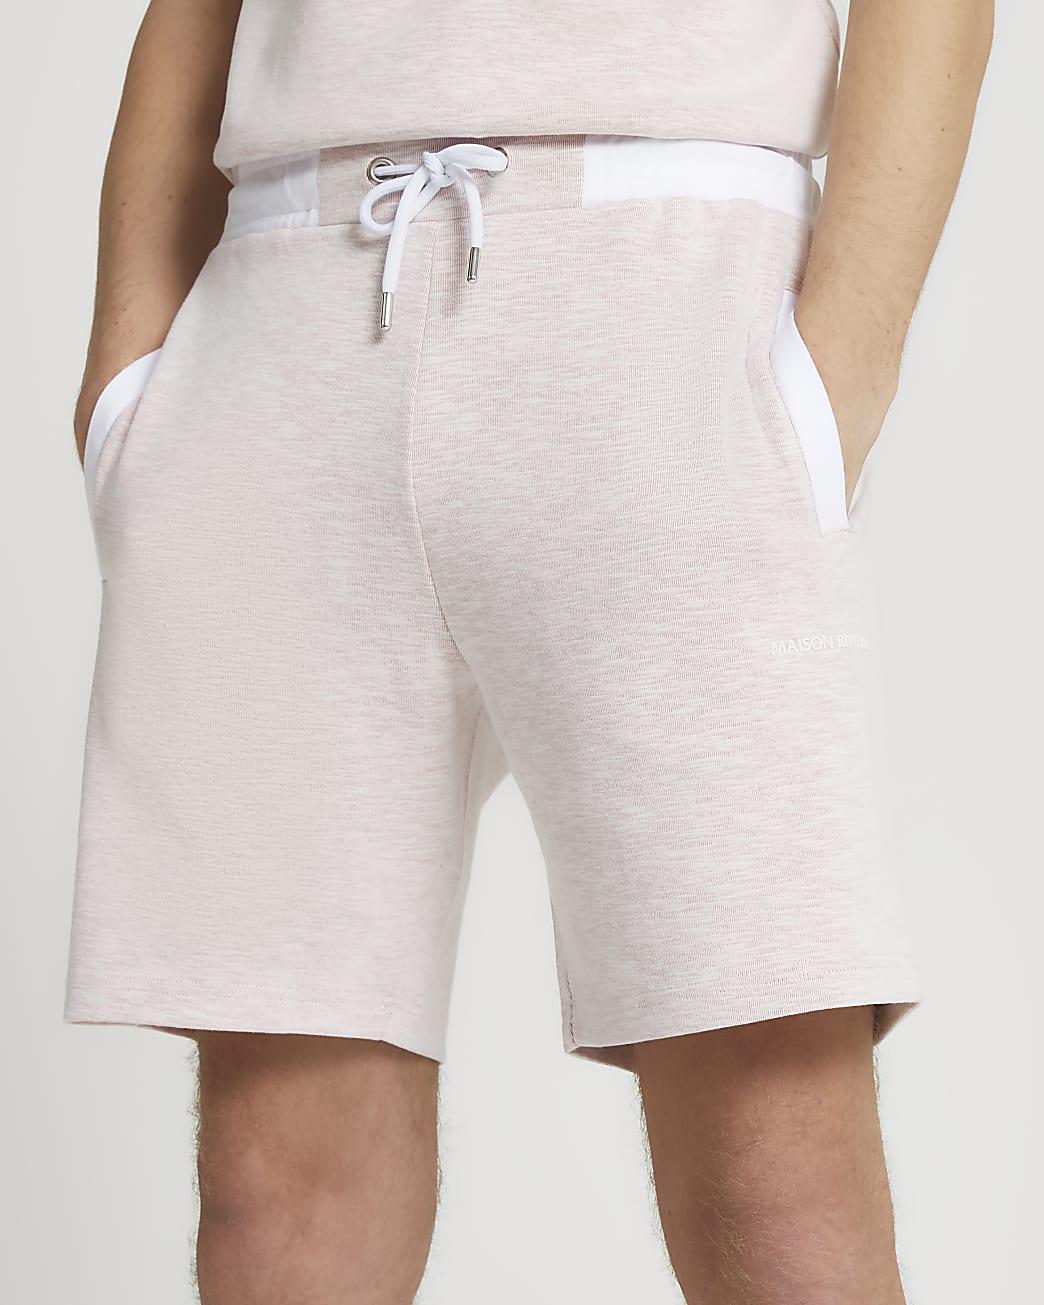 Maison Riviera pink space dye slim fit shorts